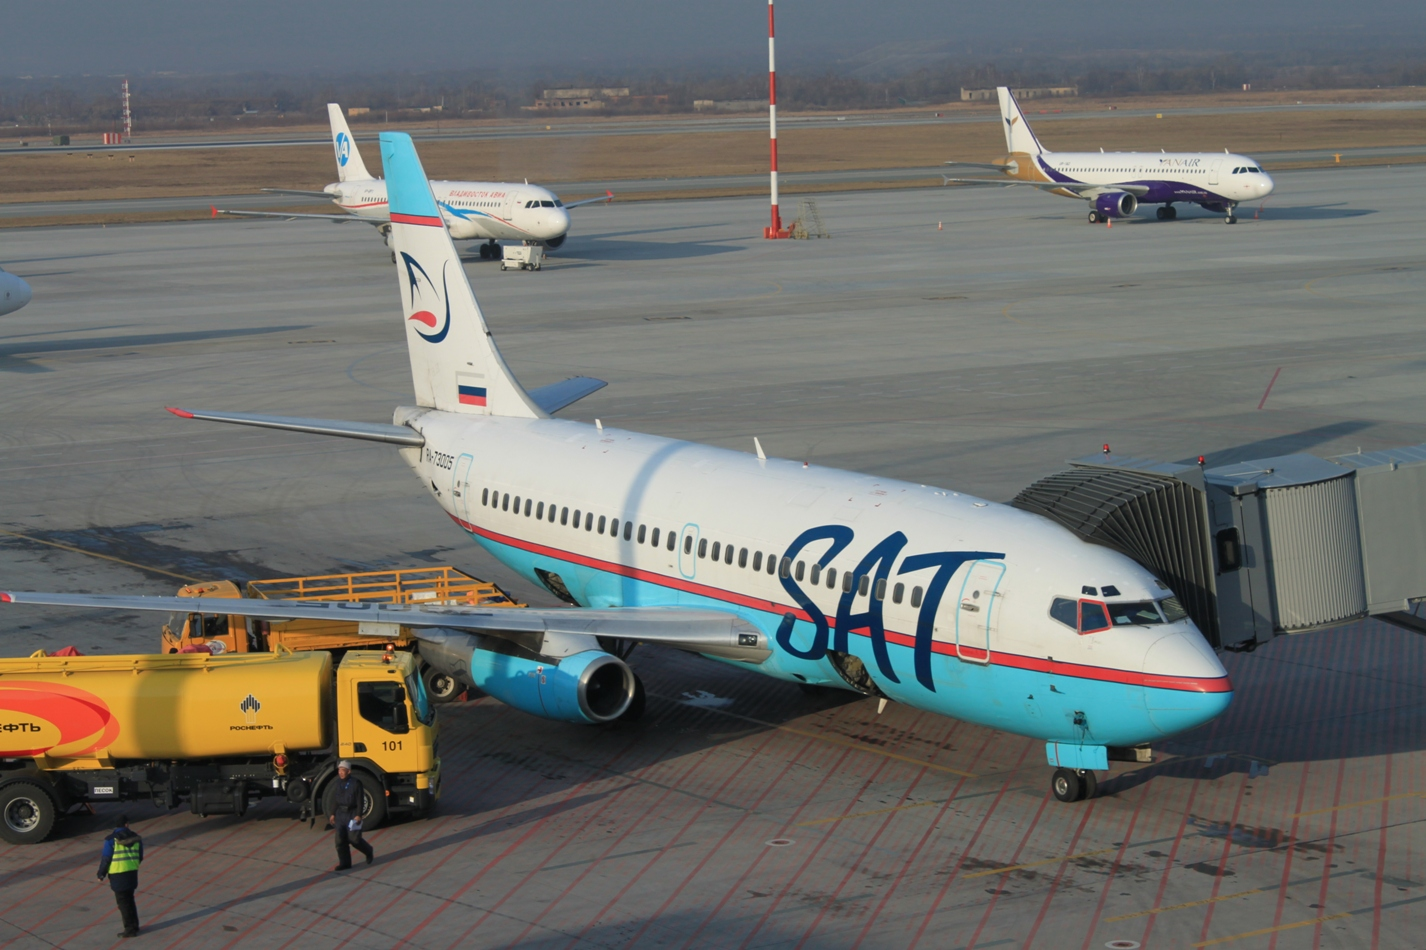 Боинг-737-200 Сахалинских авиатрасс в аэропорту Владивостока